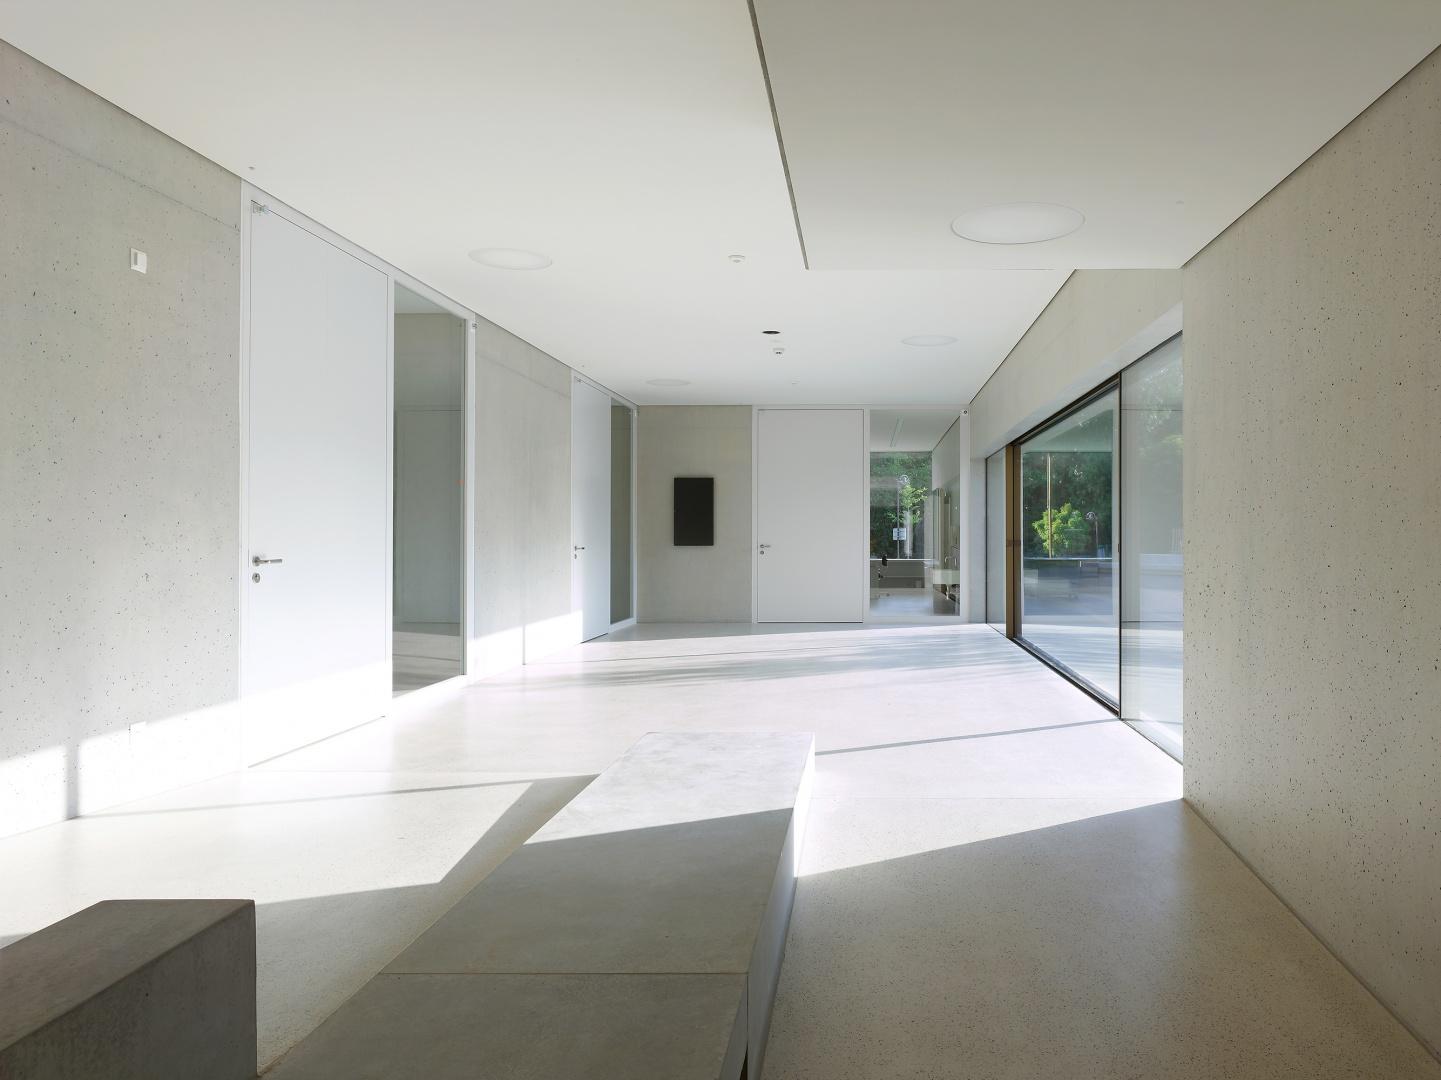 Gang und Eingang Saal  © Thomas Jantscher